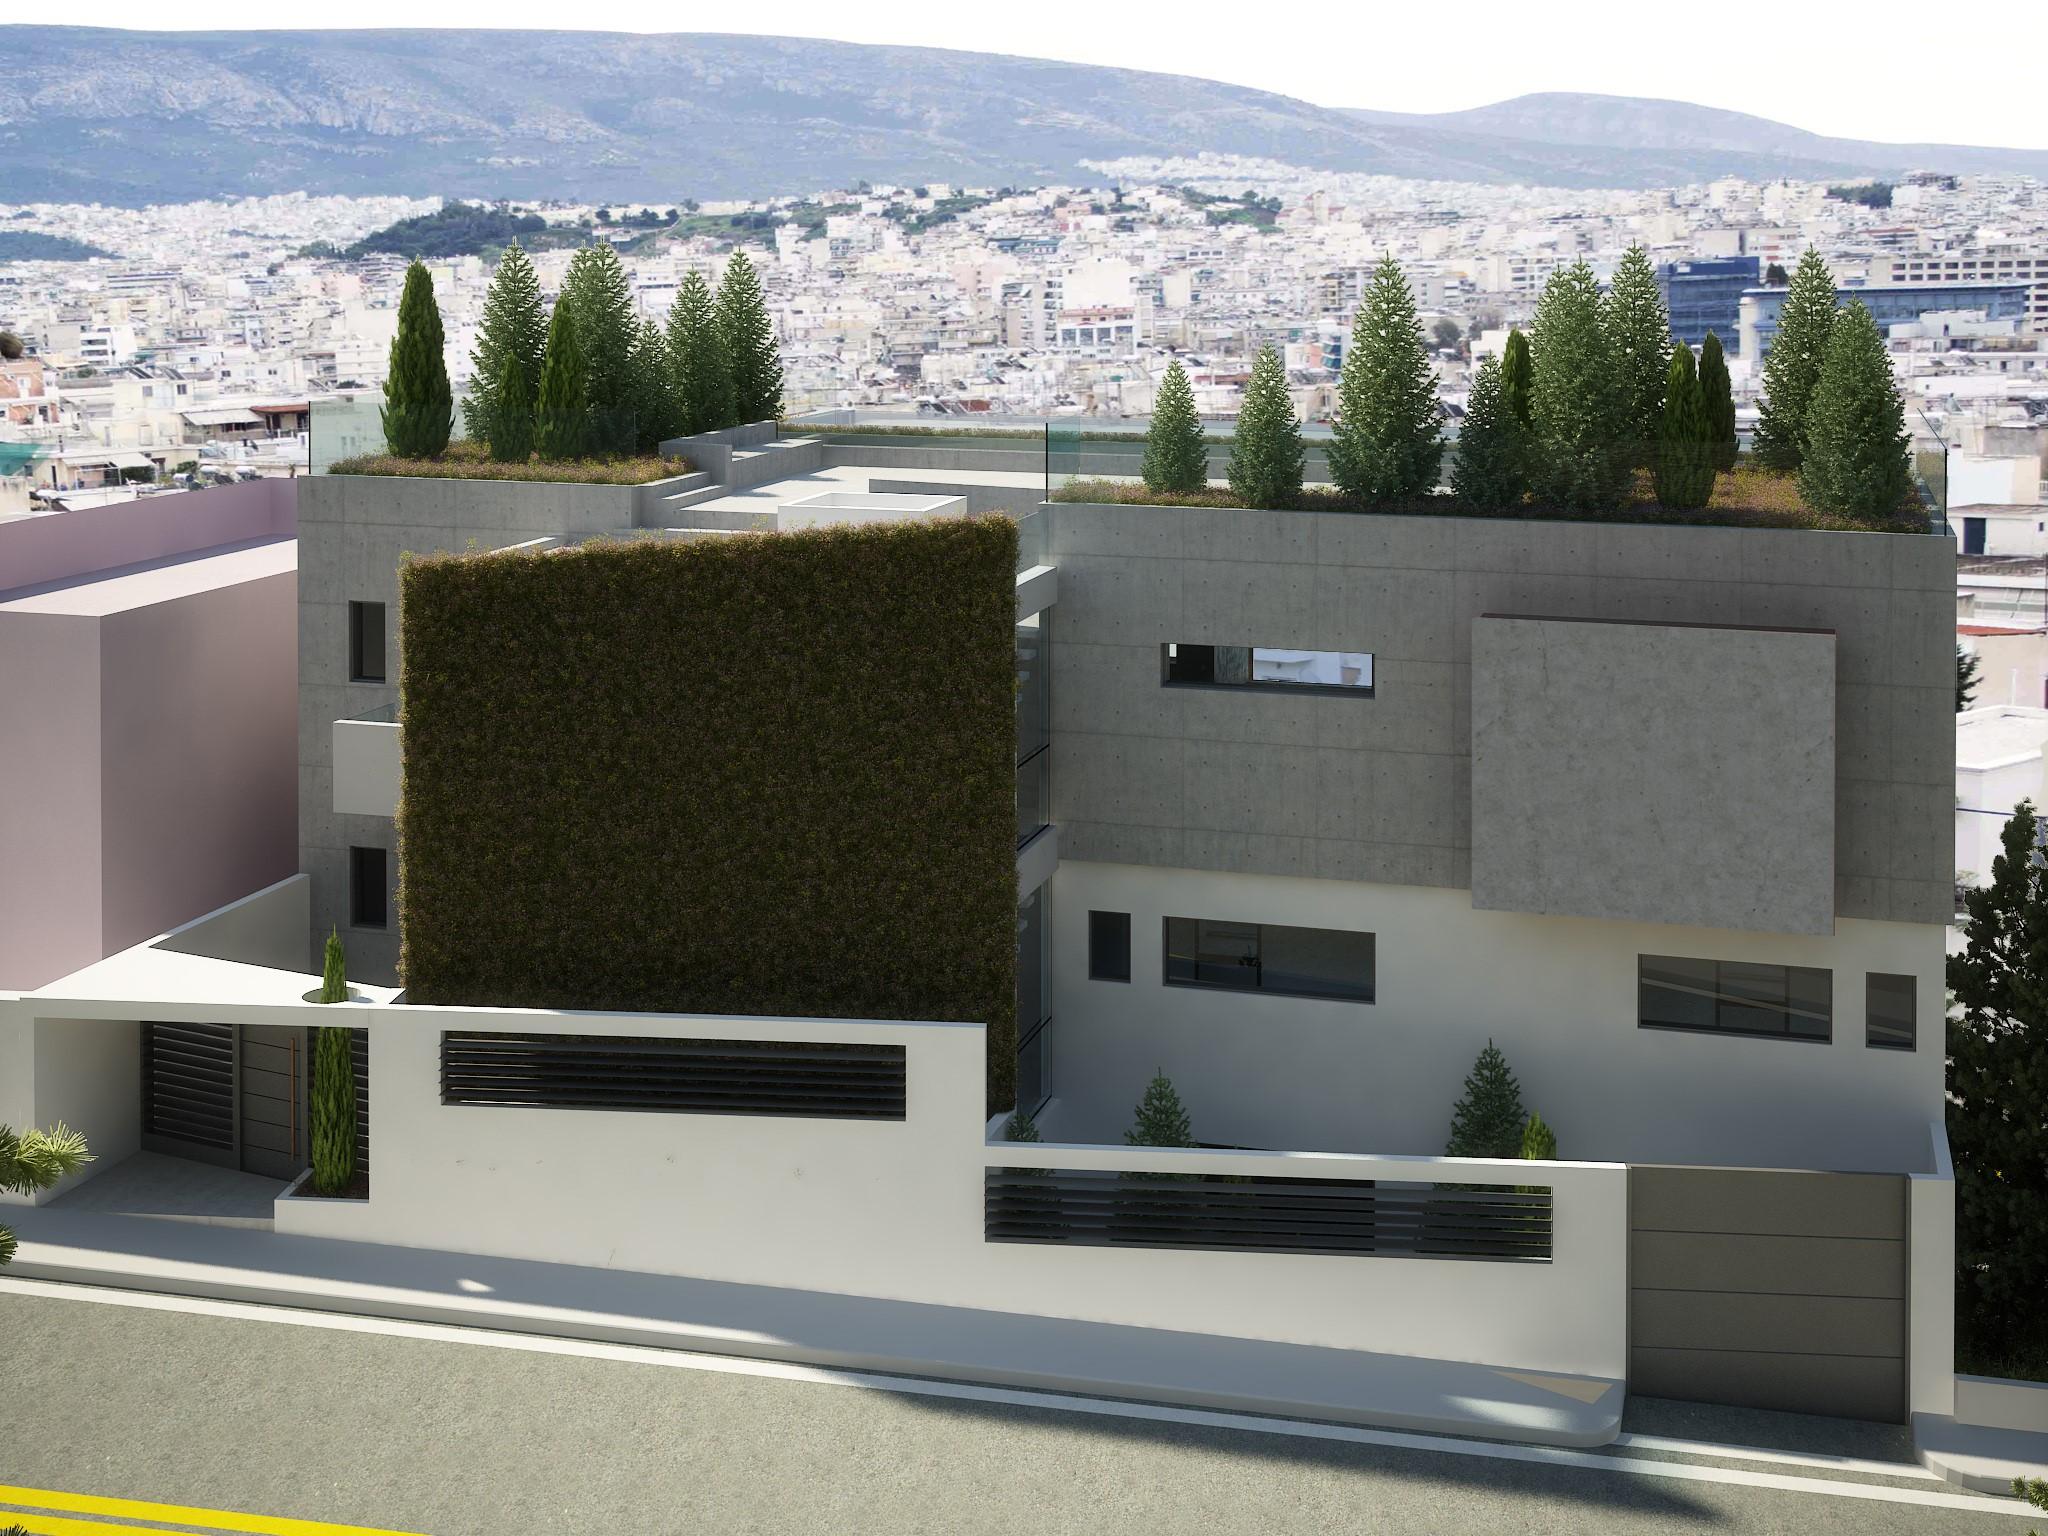 Filopappou Residence